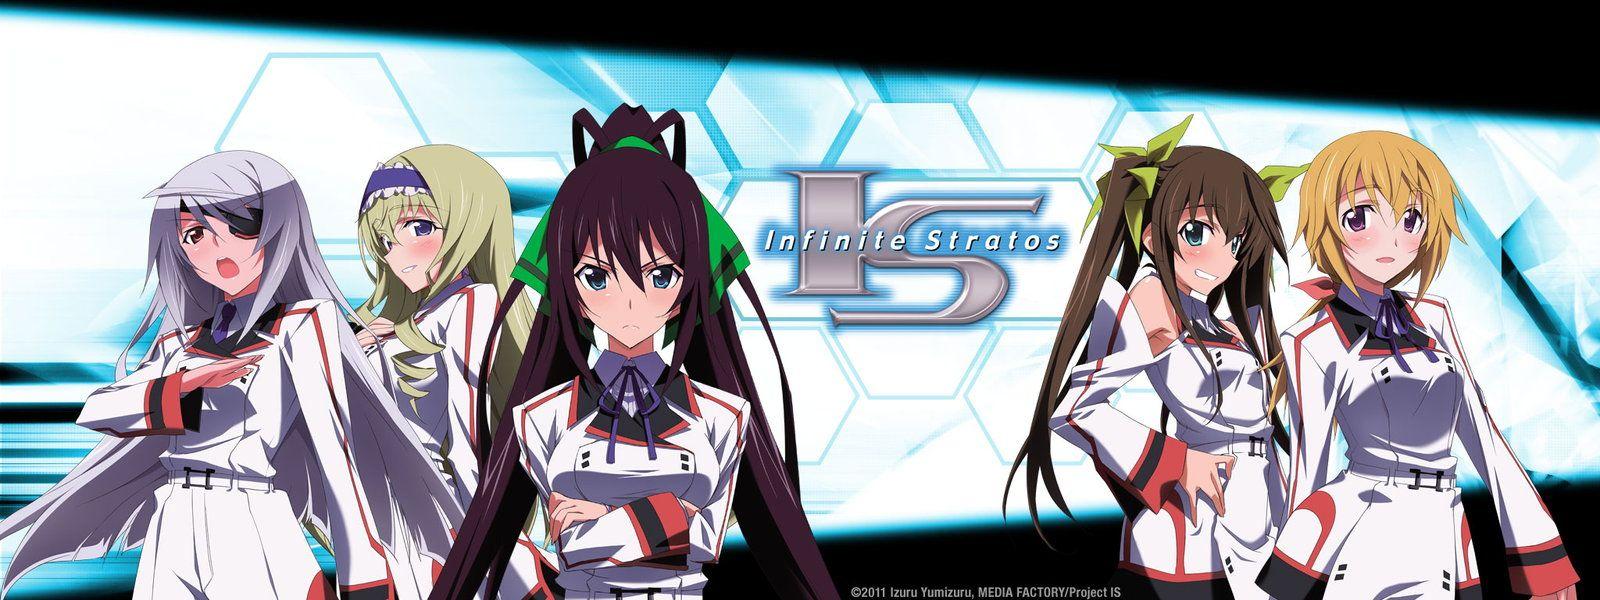 Watch Infinite Stratos online Free Hulu Melhores mangas